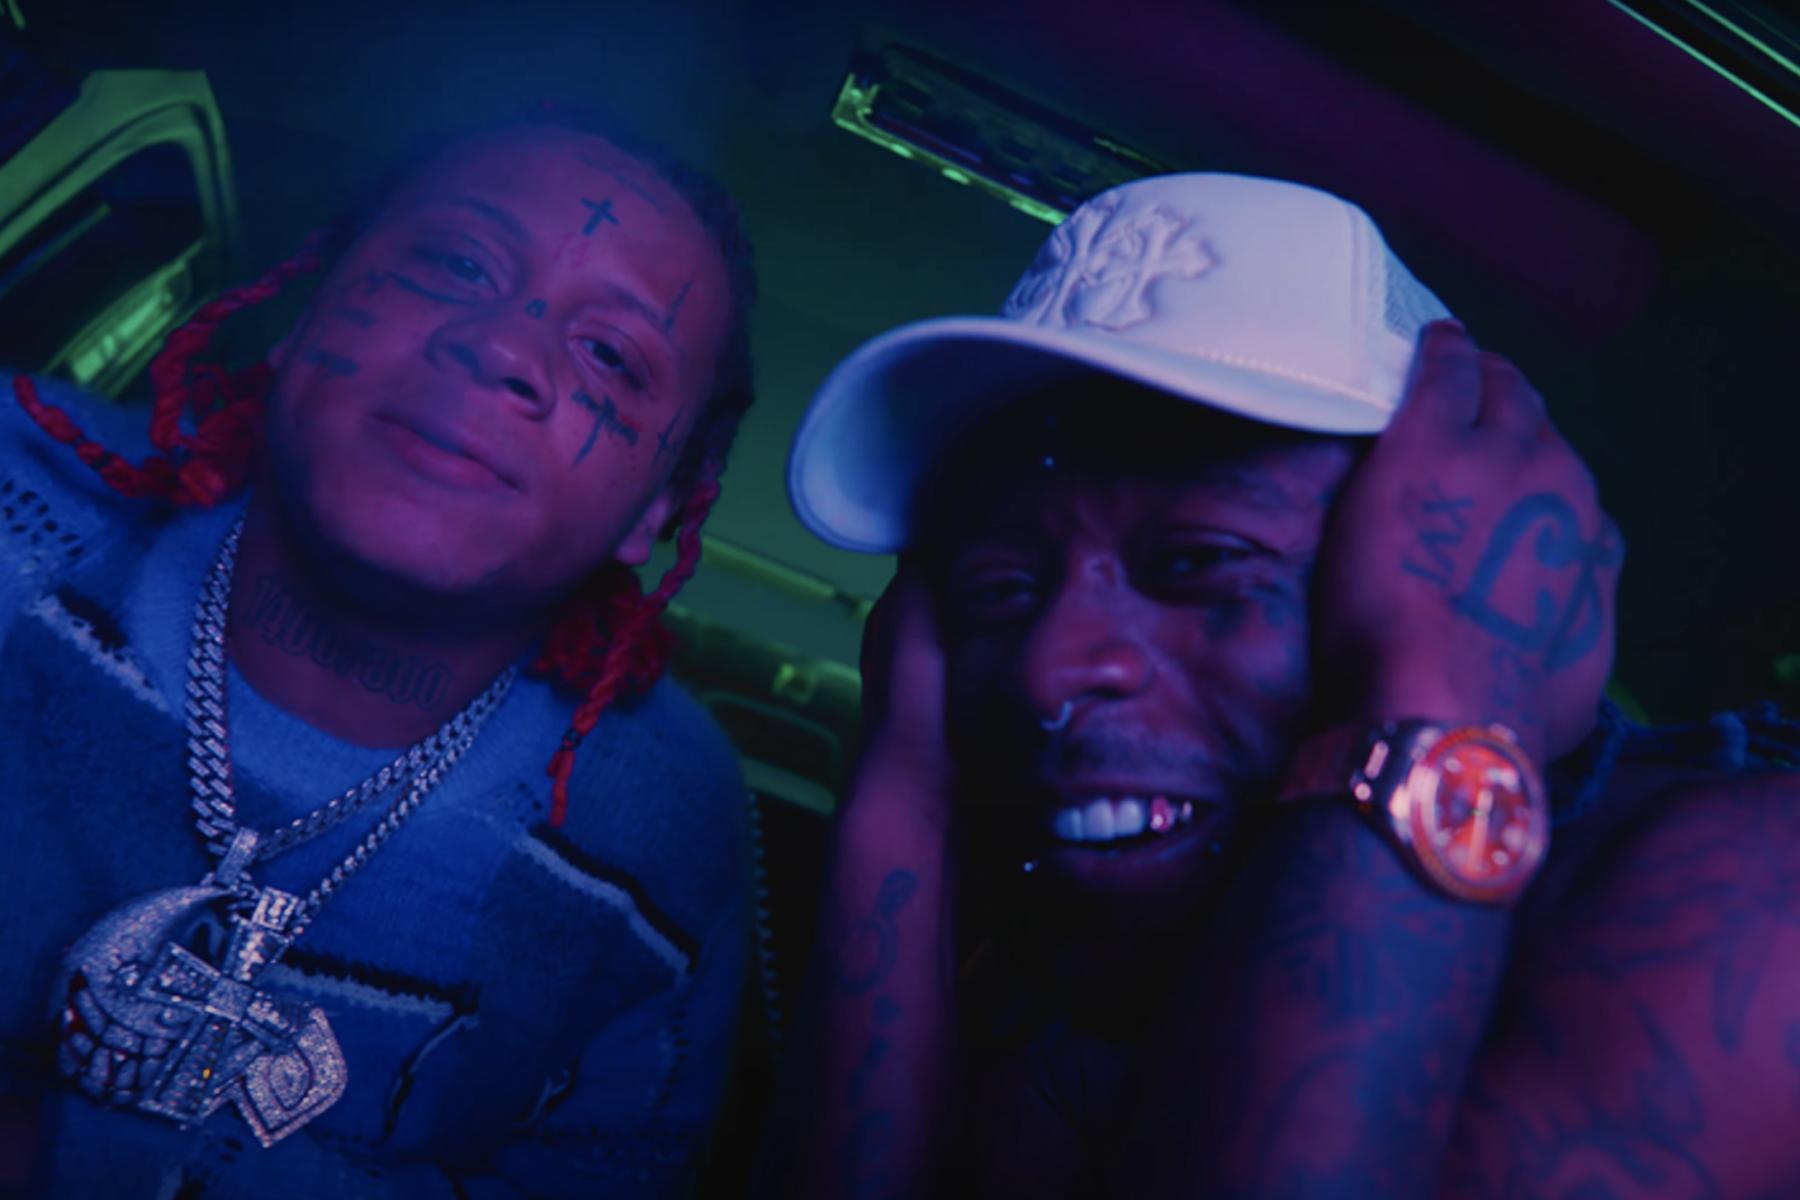 Trippie Redd, Lil Uzi Vert Hit the Arcade in New 'Holy Smokes' Video